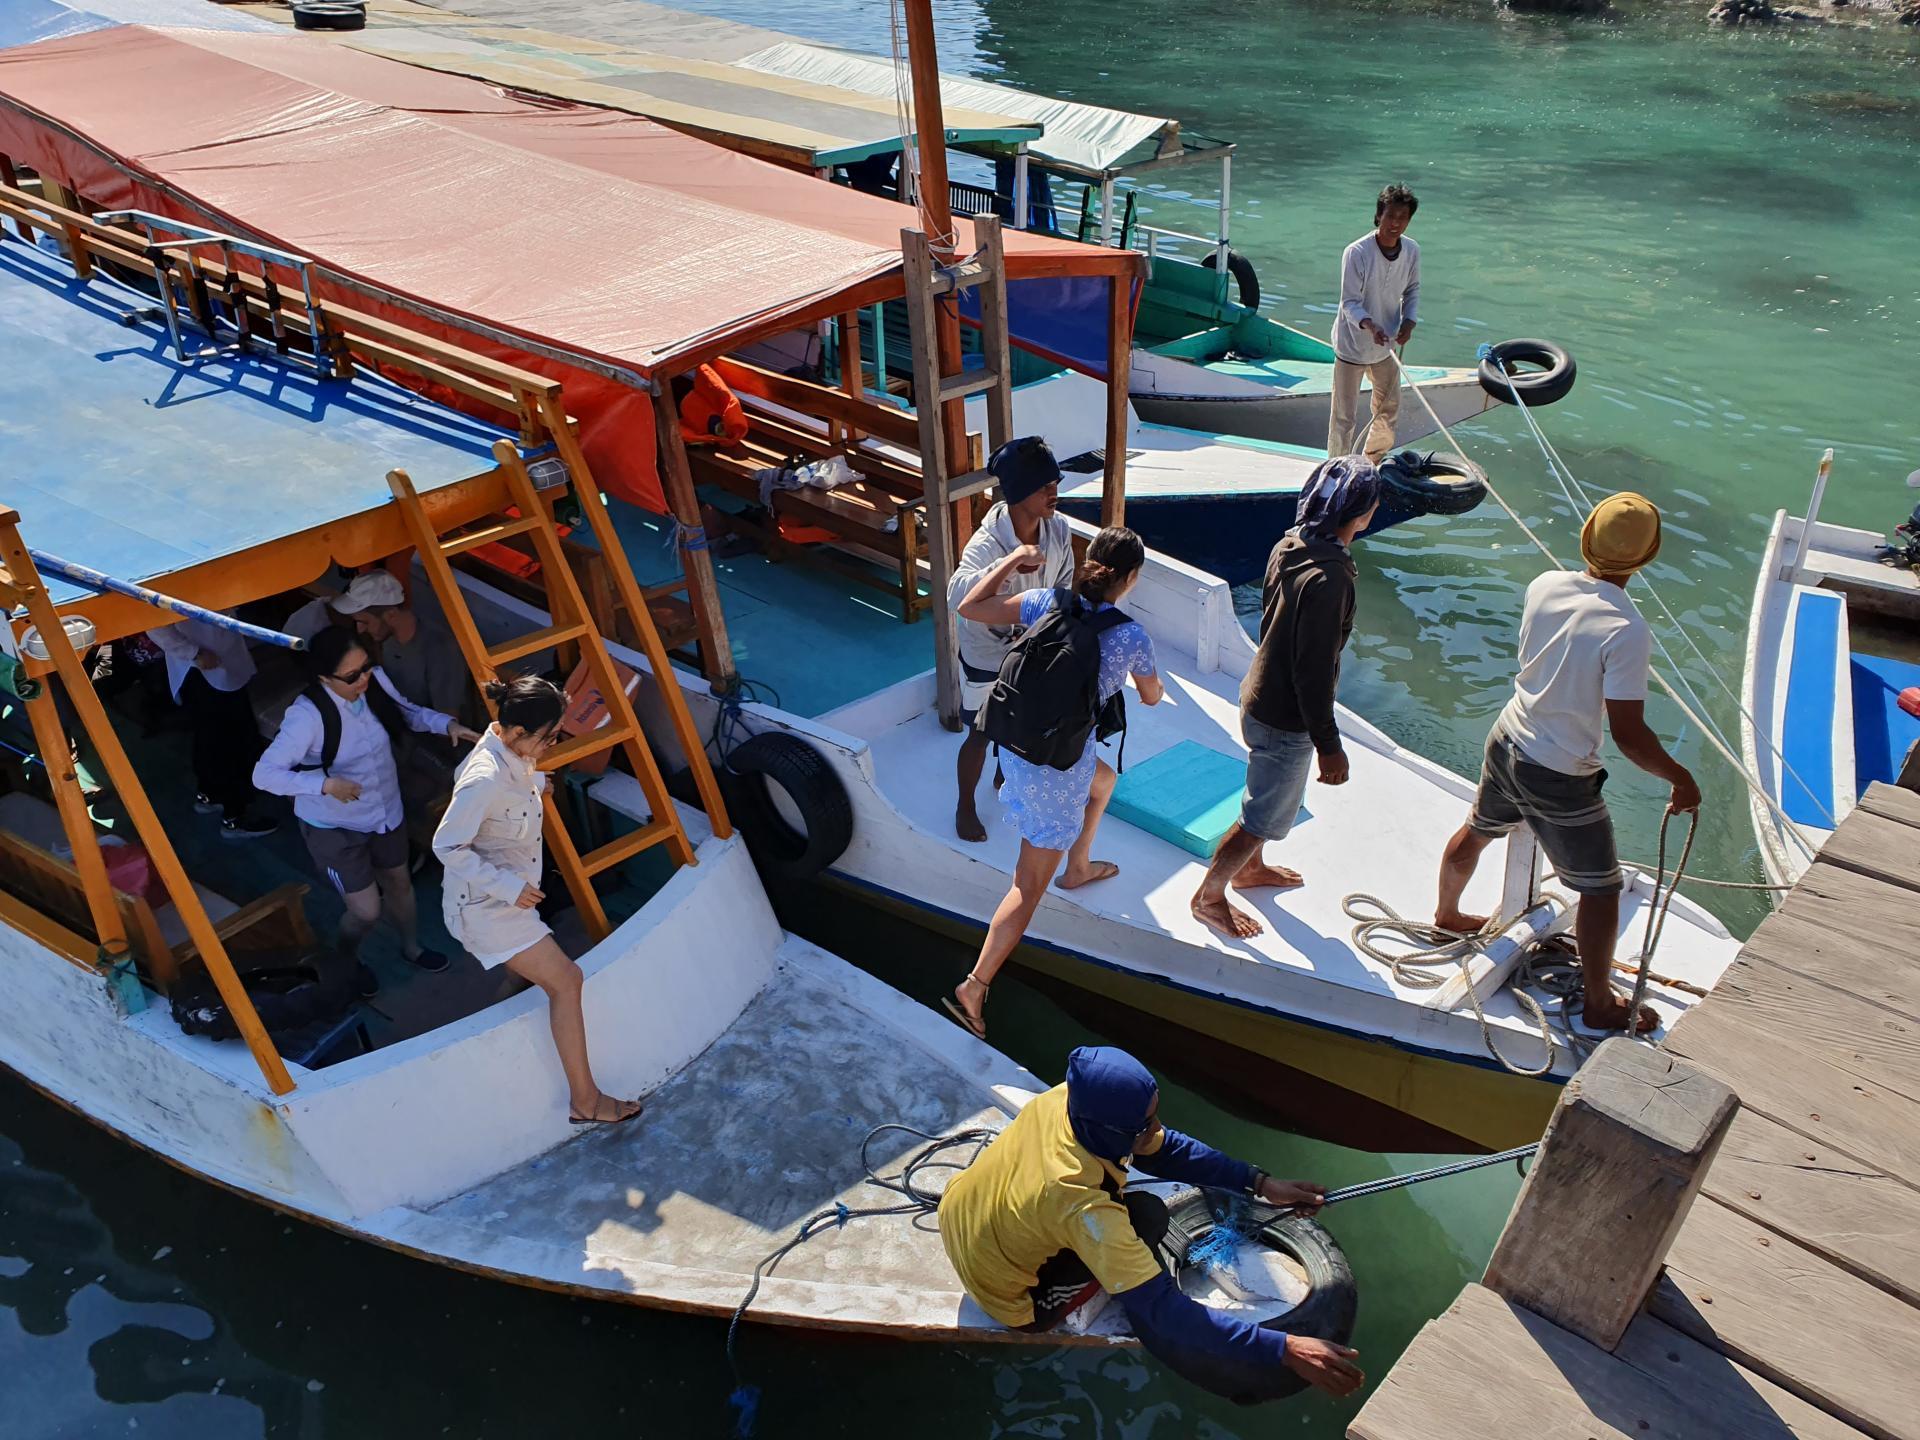 капитан крепит лодку к причалу